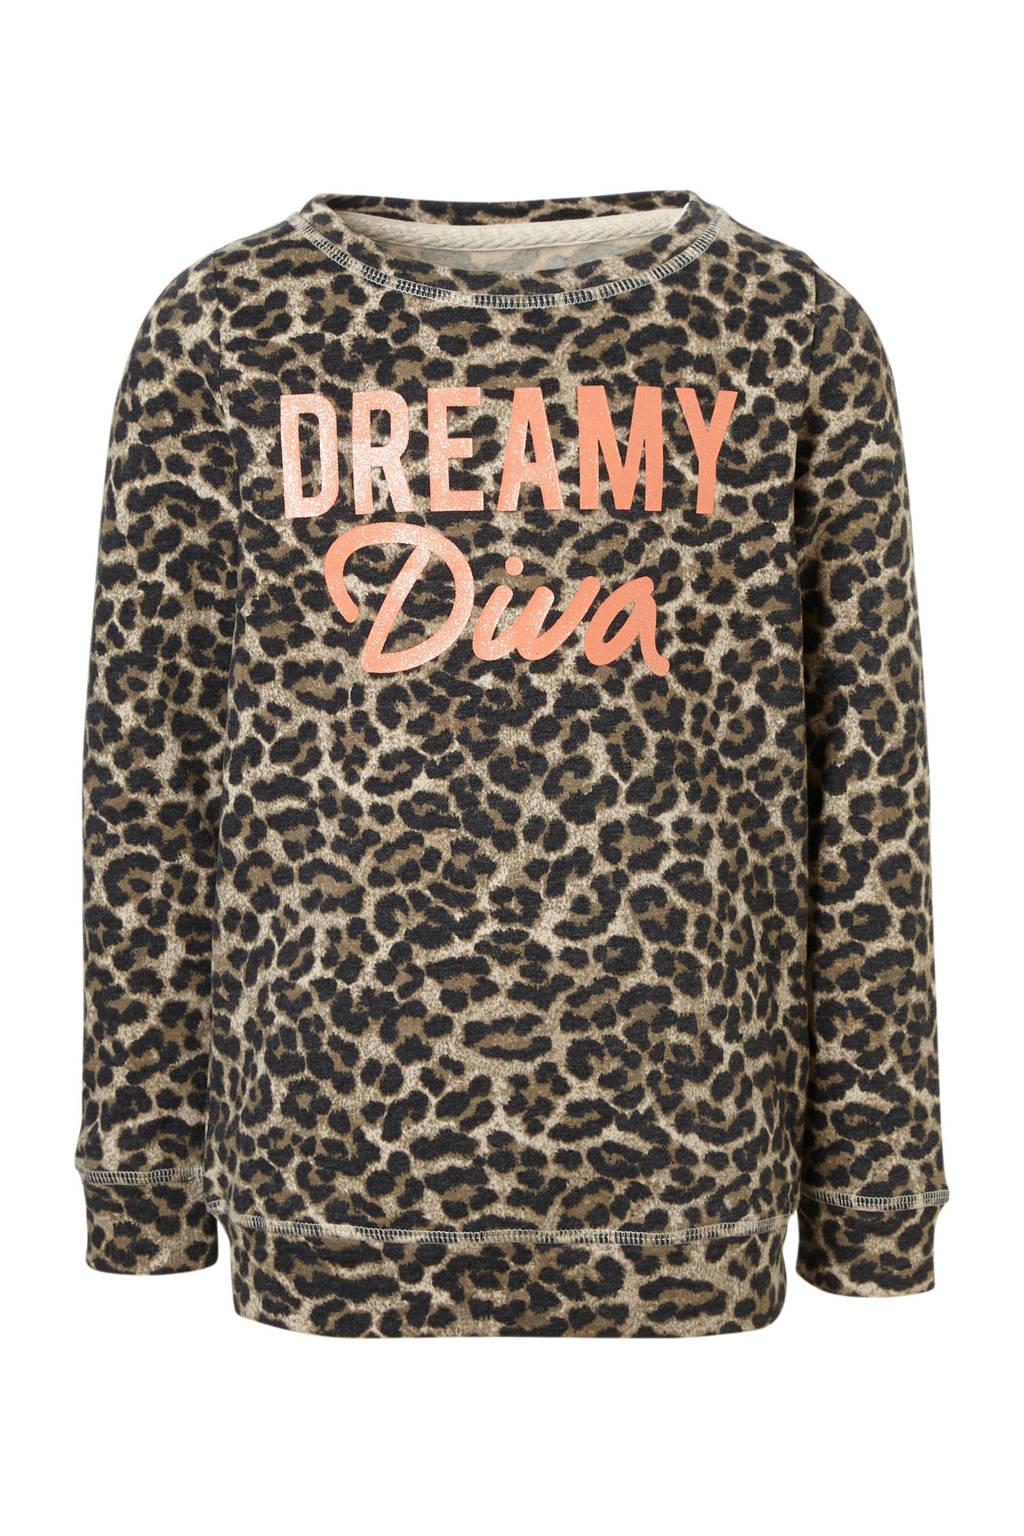 KIDSONLY sweater Sound met panterprint, Bruin/ zwart/ zalmroze